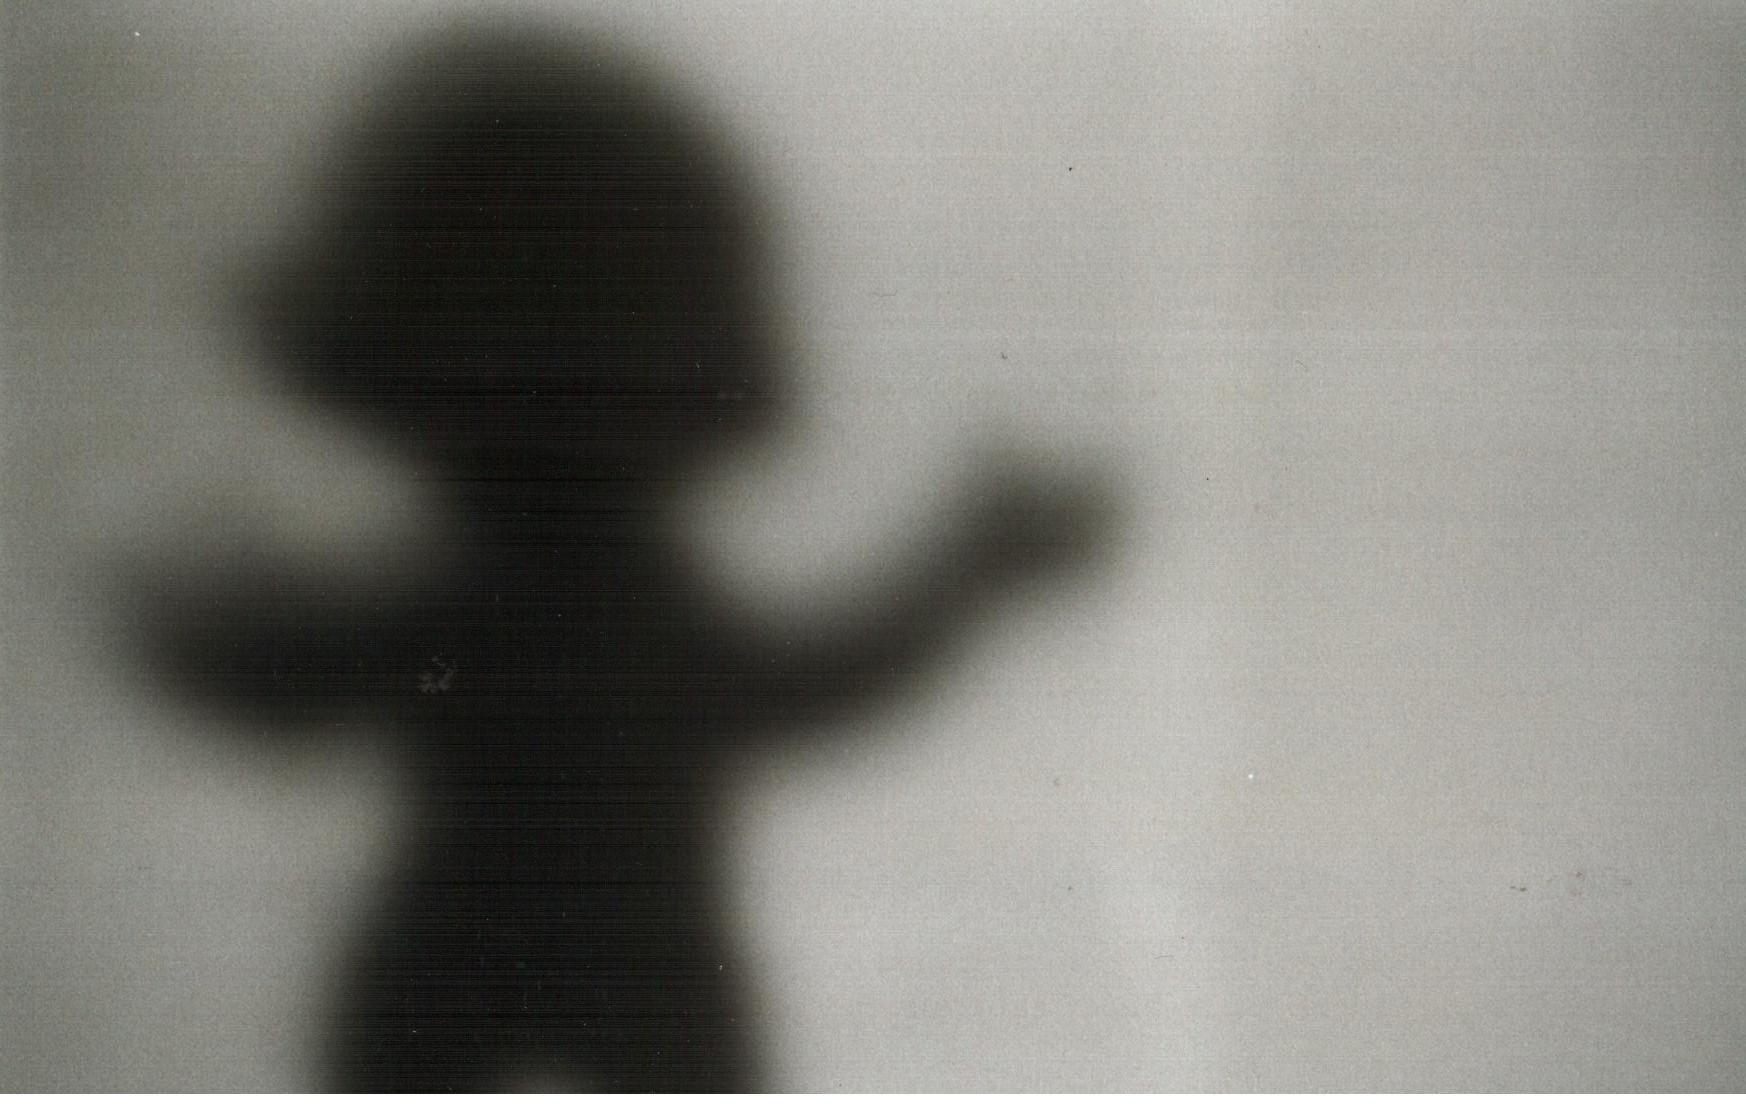 Un'immagine del video di HD Blue di Daniele Celona